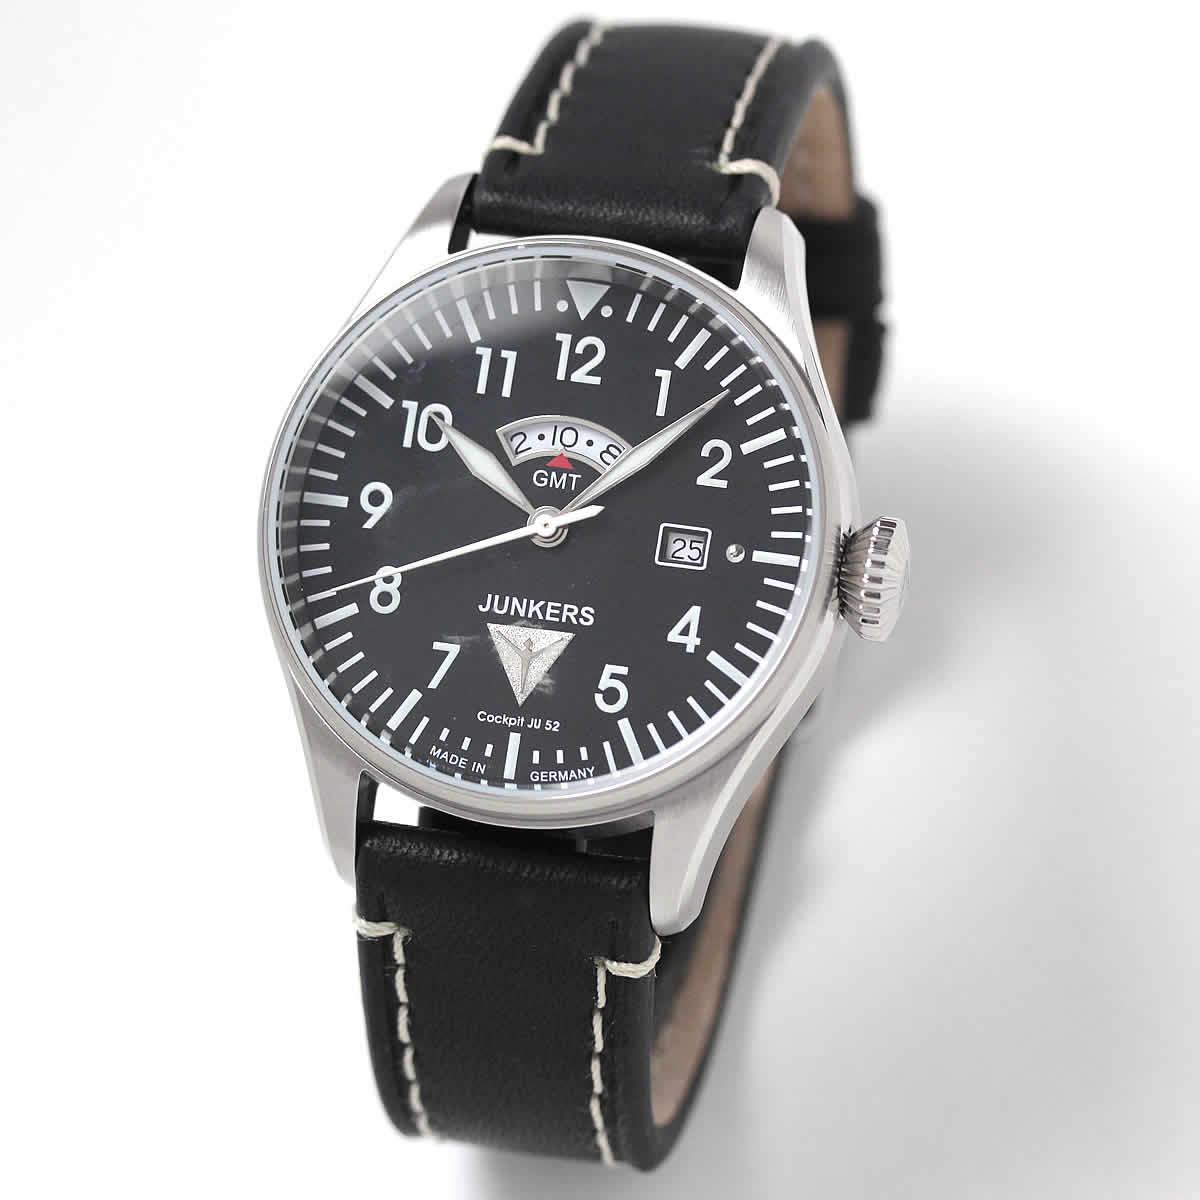 JUNKERS(ユンカース)/Cockpit JU52/クォーツGMT 6140-2QZ/腕時計